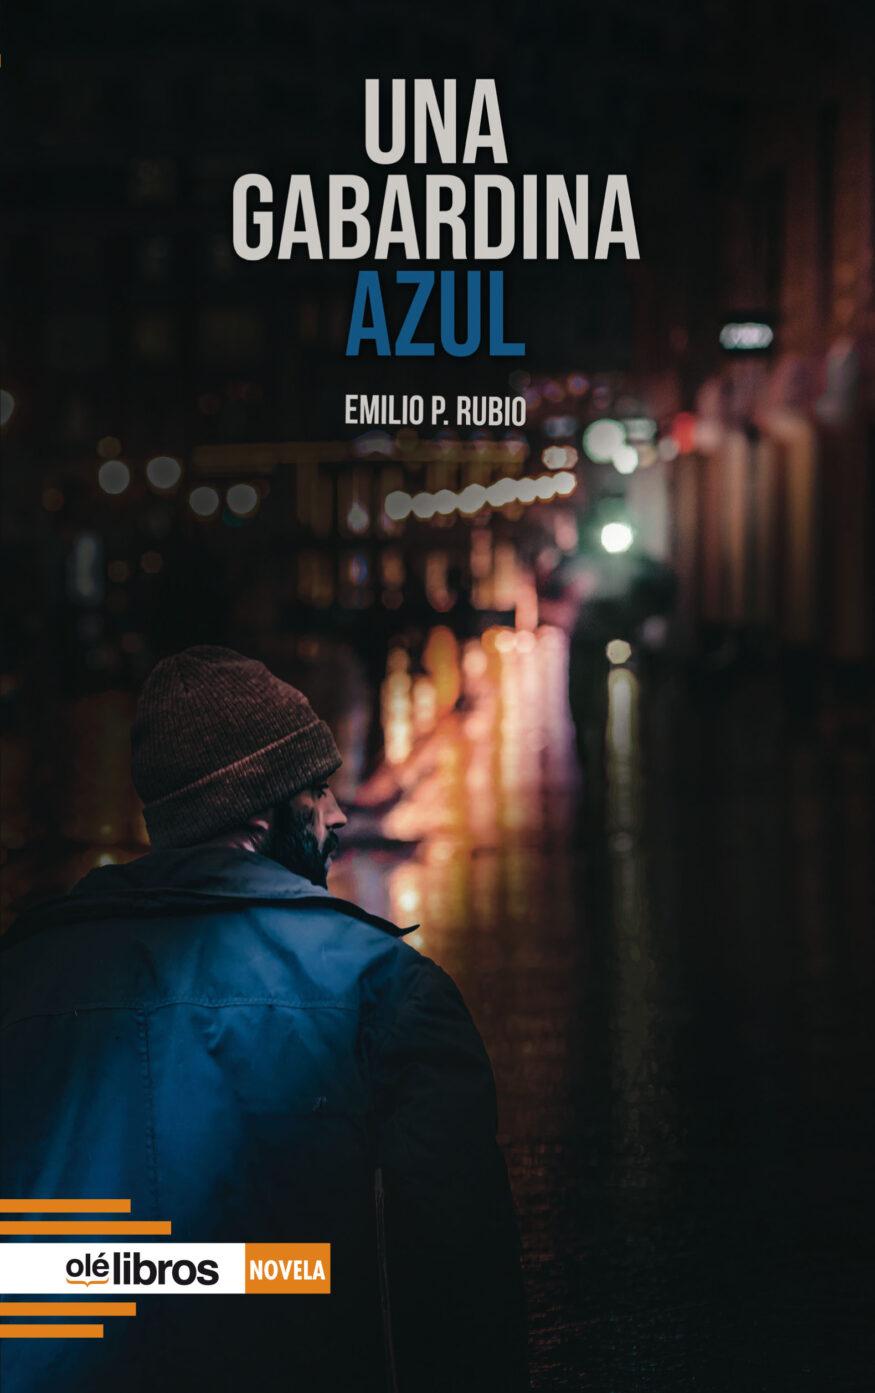 9788418759123_gabardina_azul_ole_libros